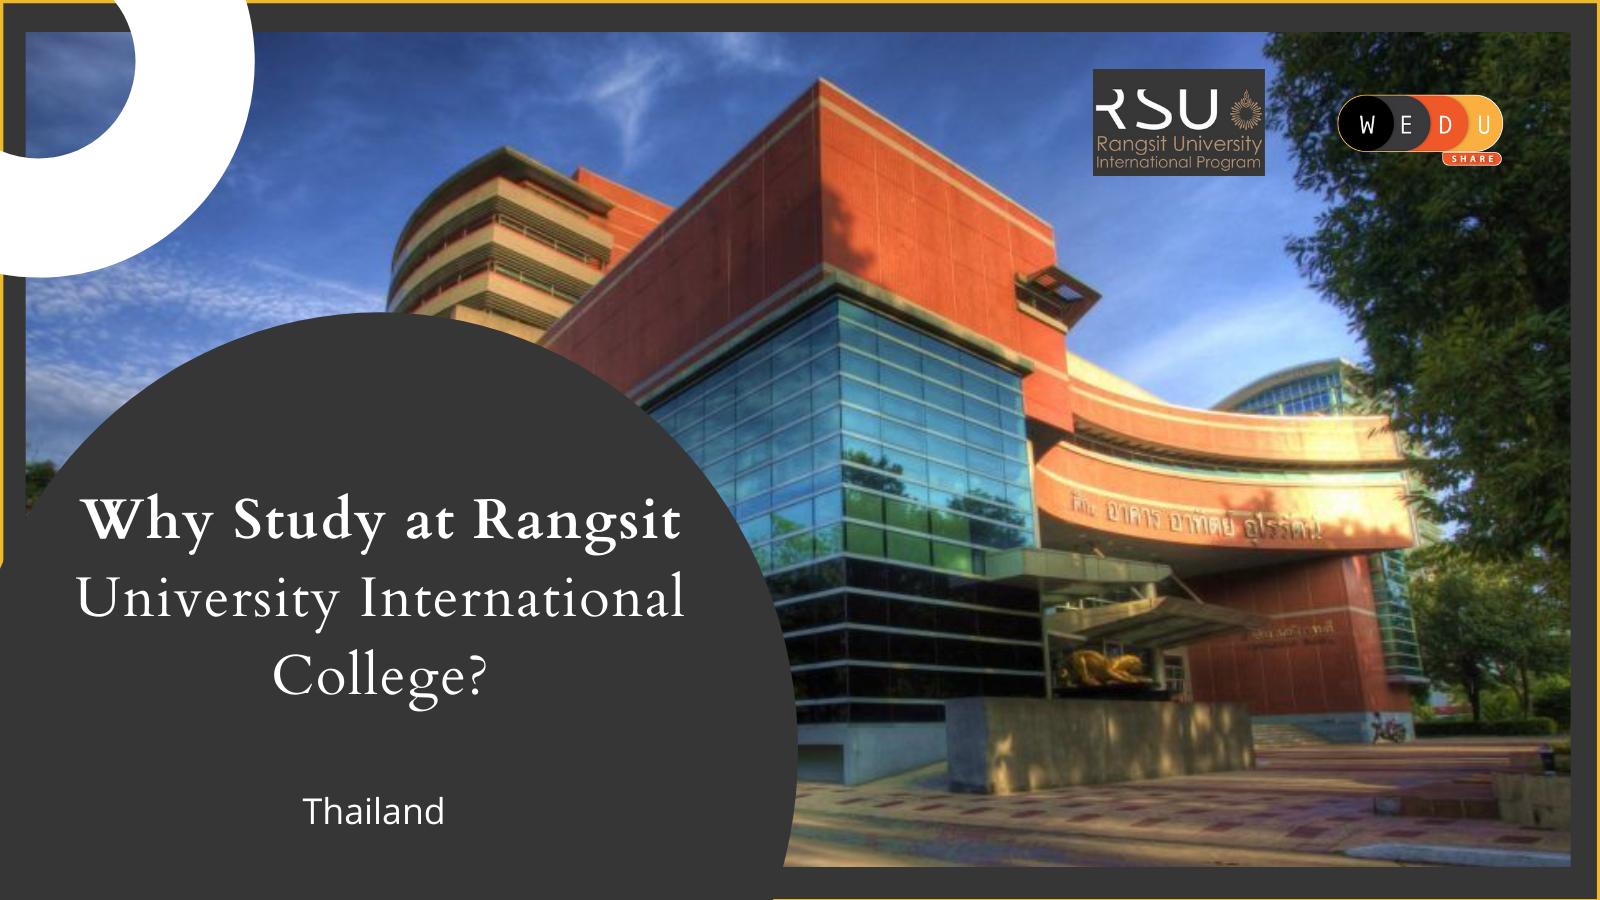 Rangsit University International College